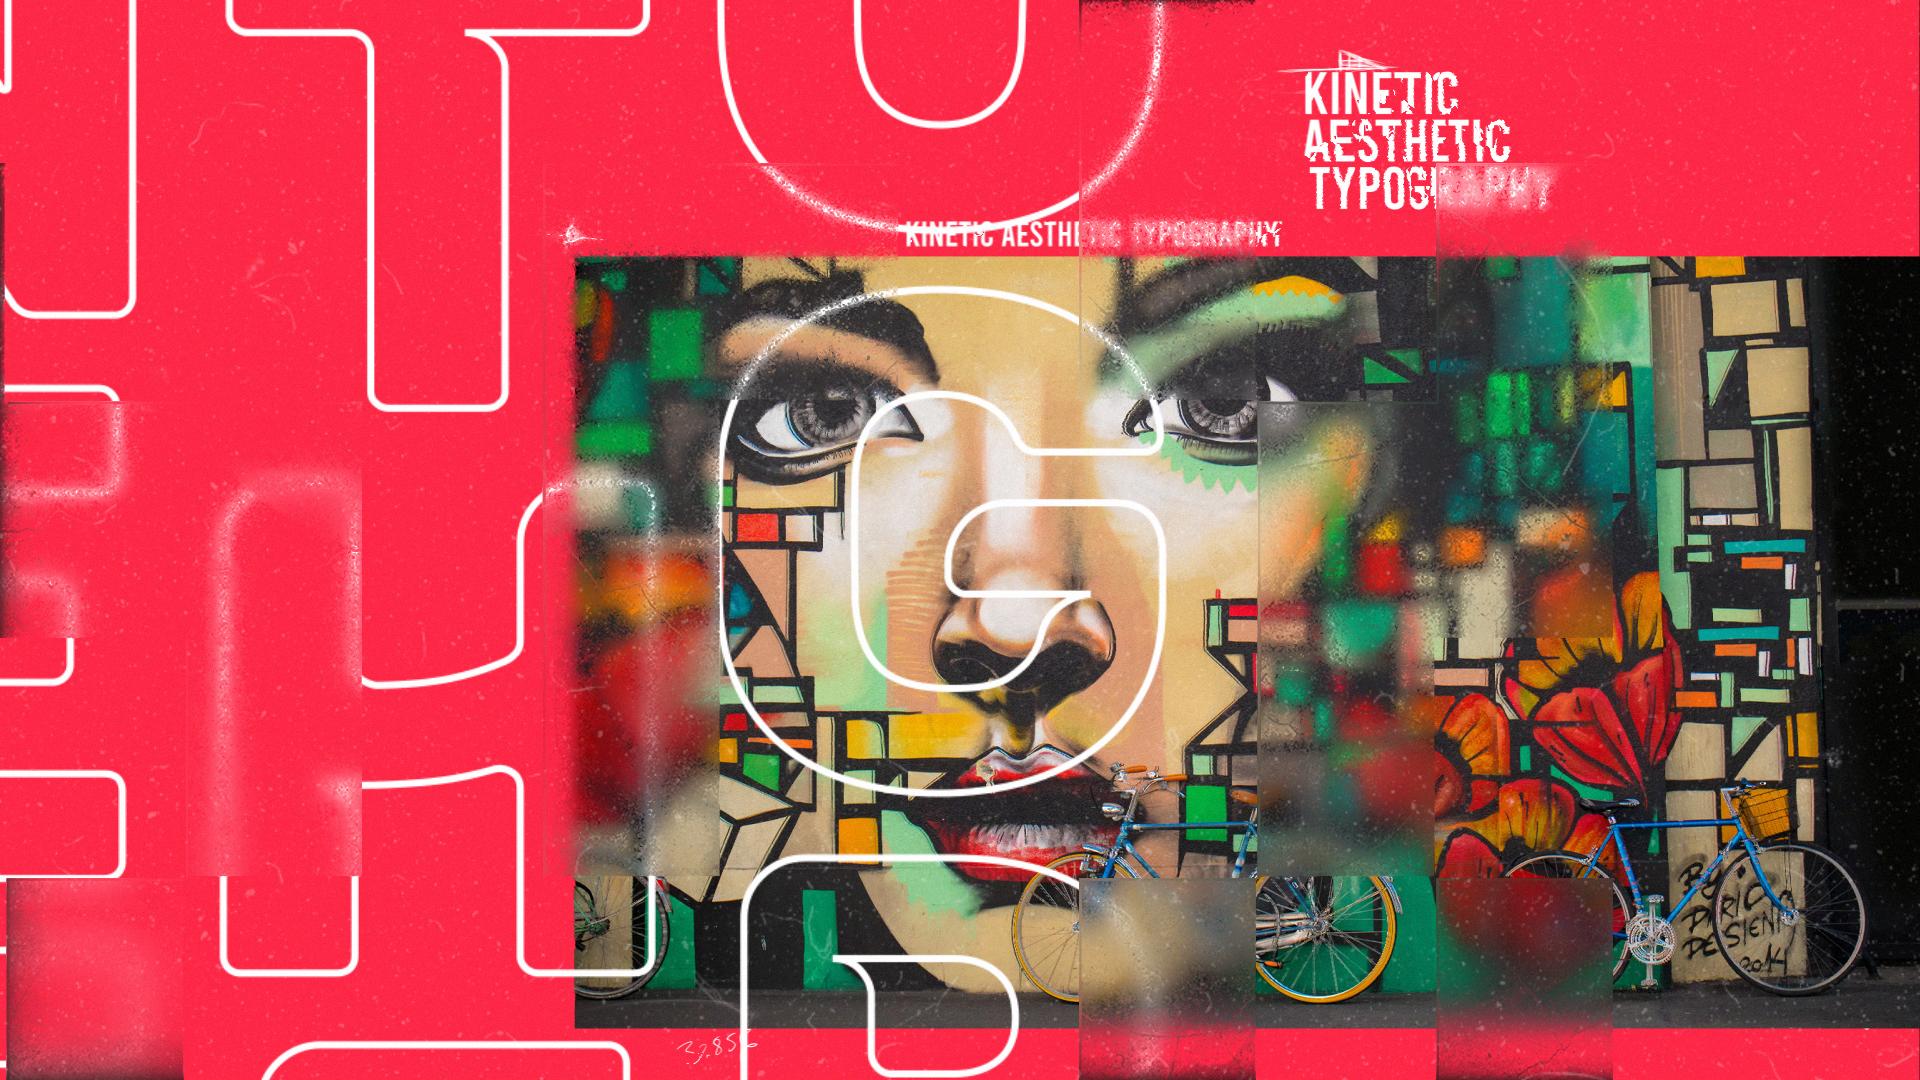 Art of The Title | Kinetic Aesthetic Typography - 2